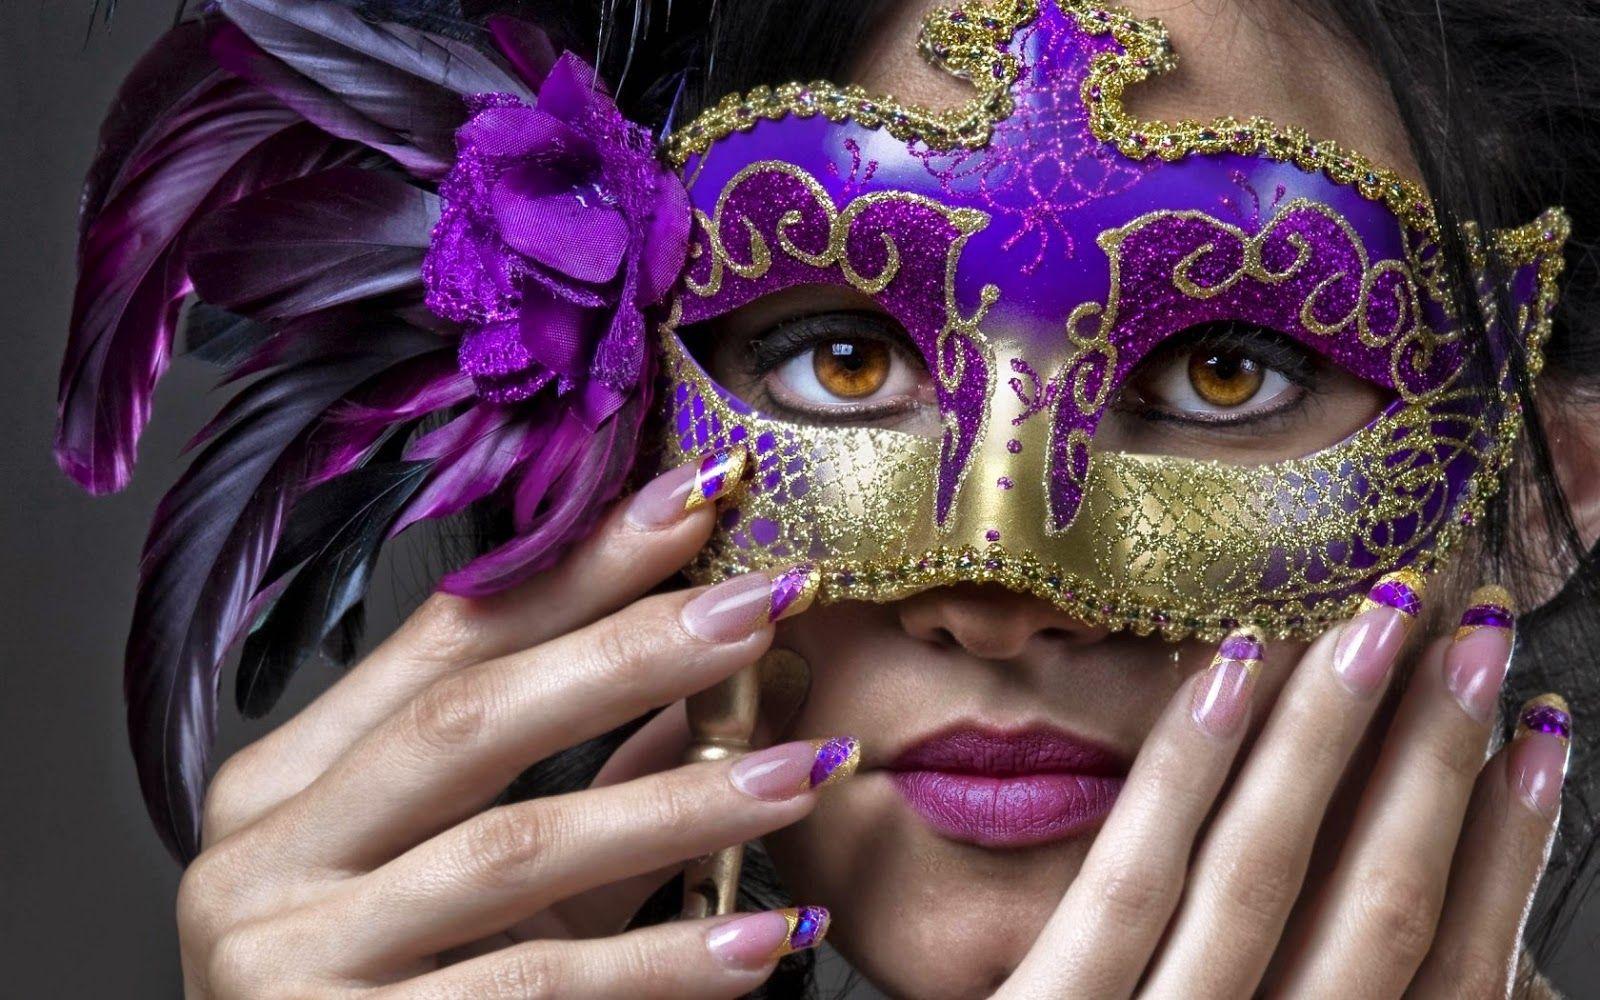 Hd Wallpapers Epic Desktop Backgrounds Carnival Of Venice Beauty Videos Female Mask